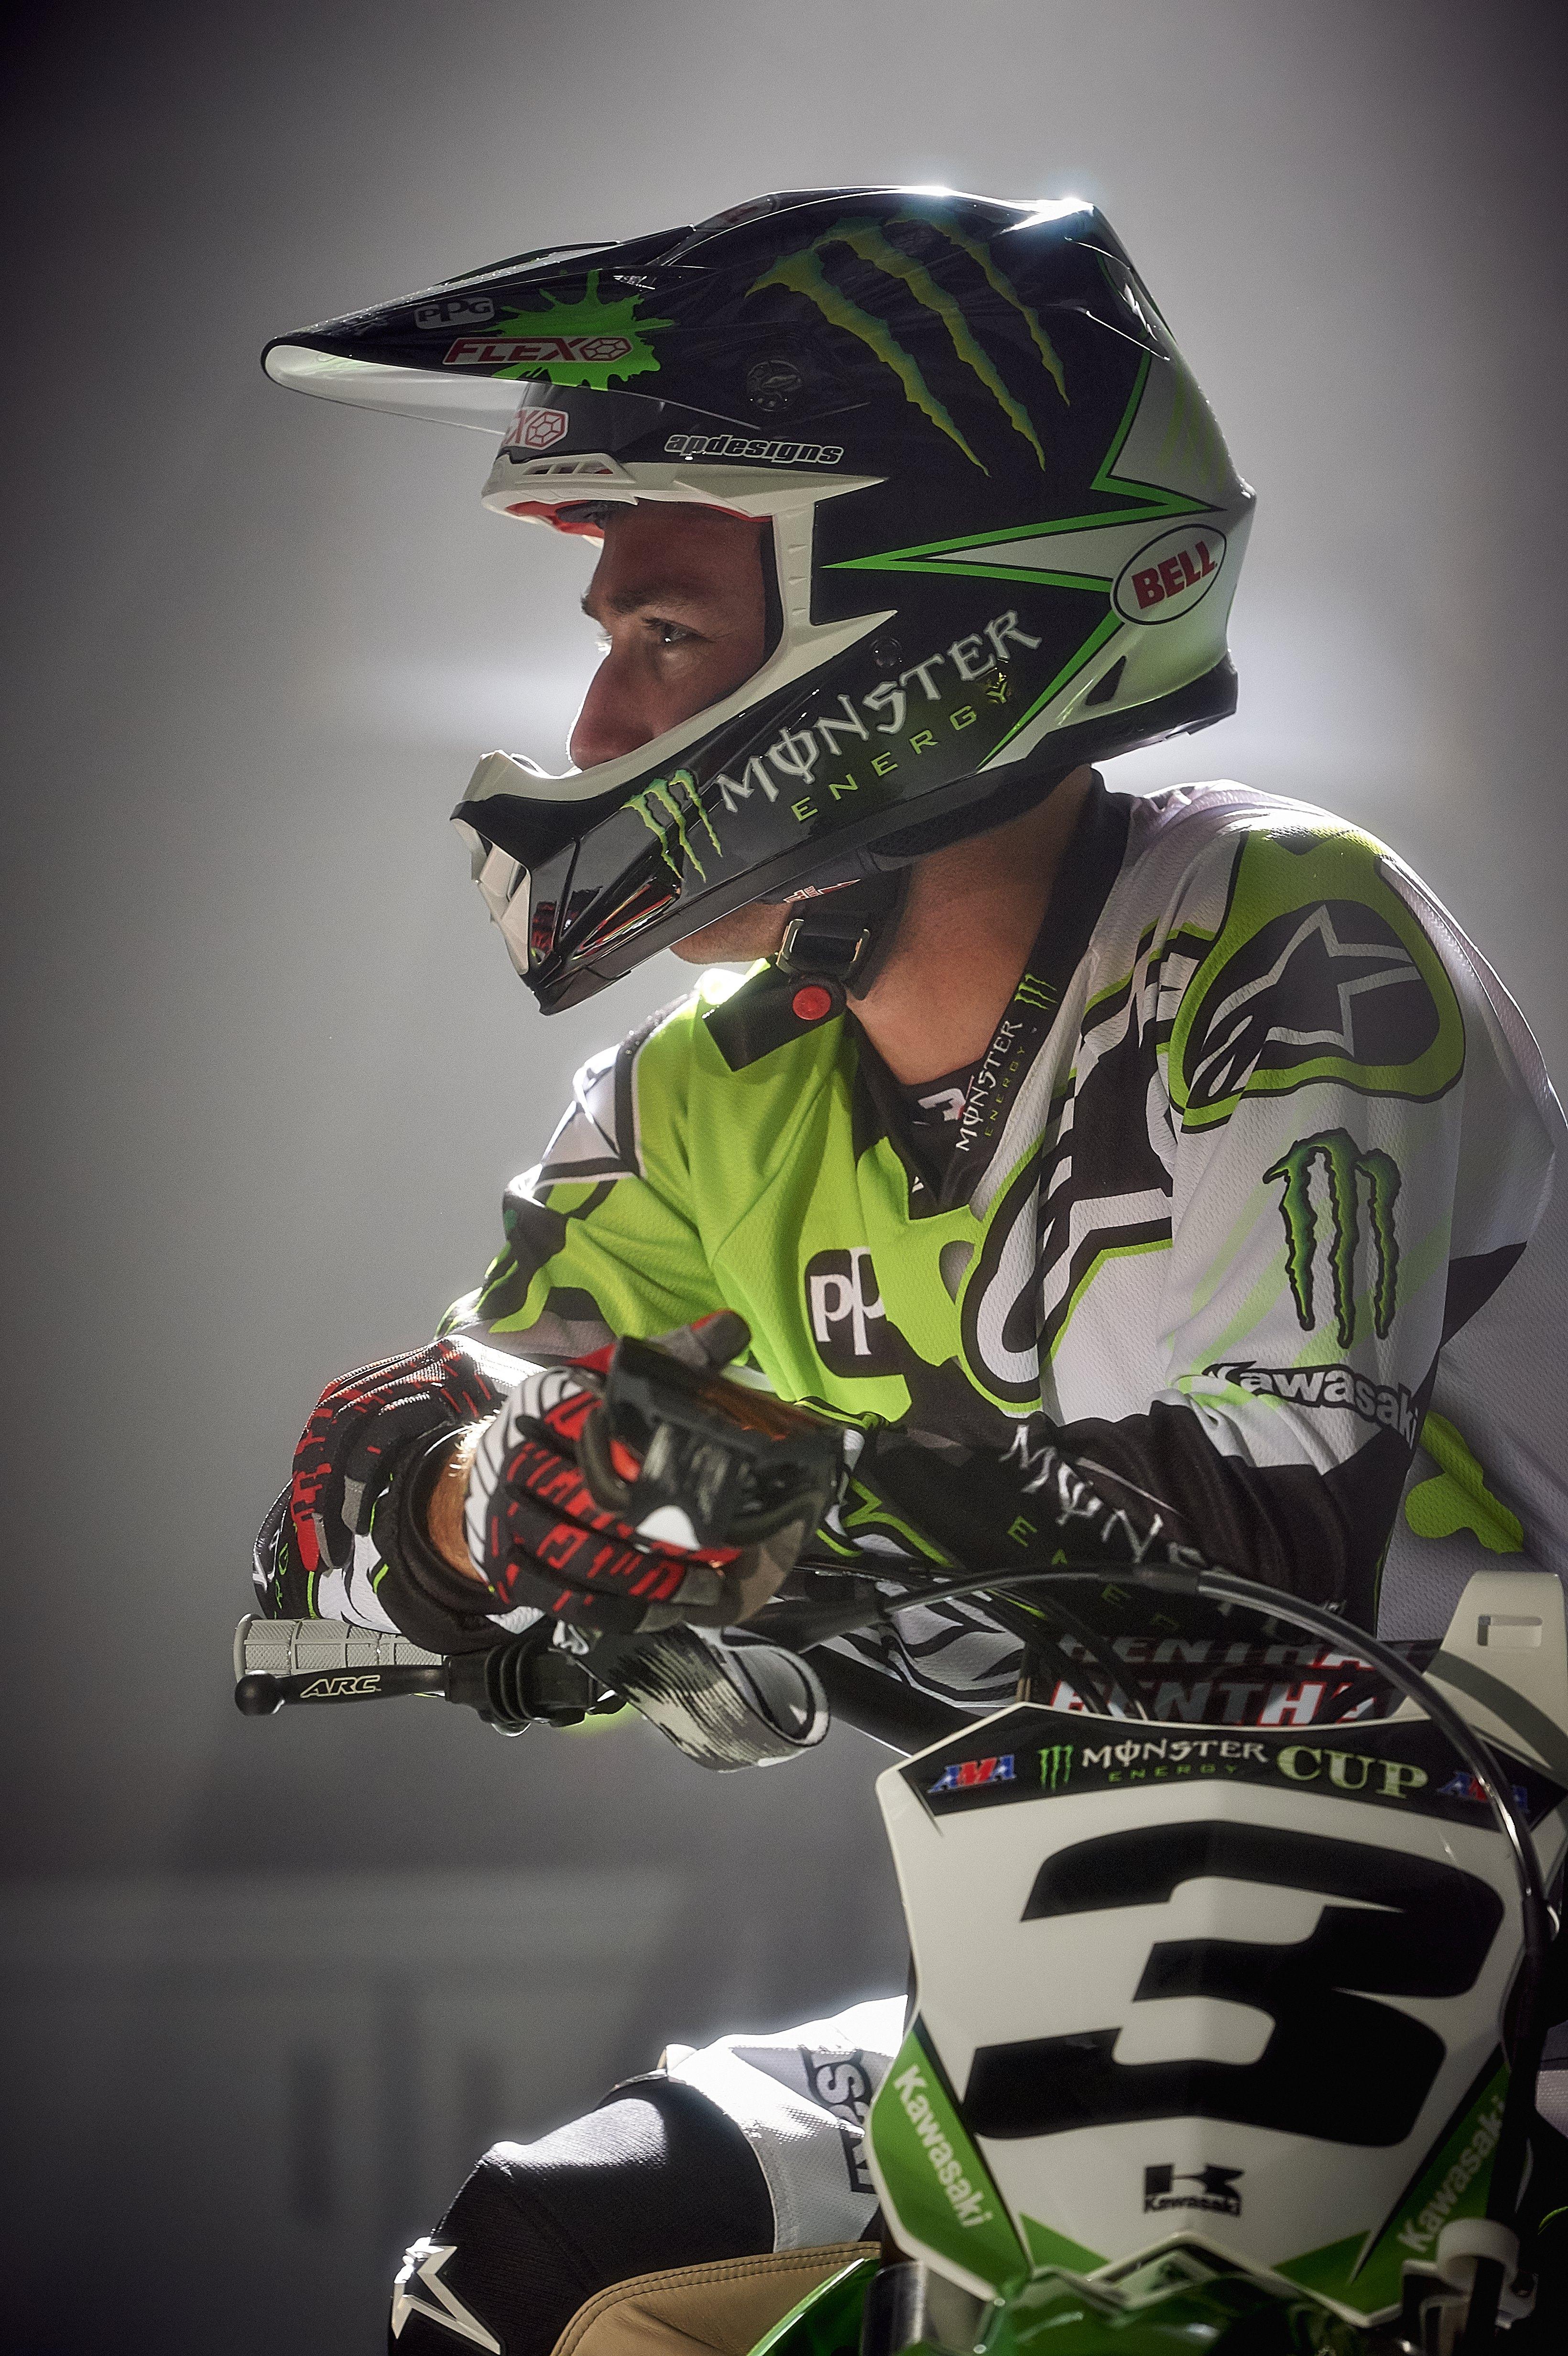 Monster Energy Kawasaki Riders